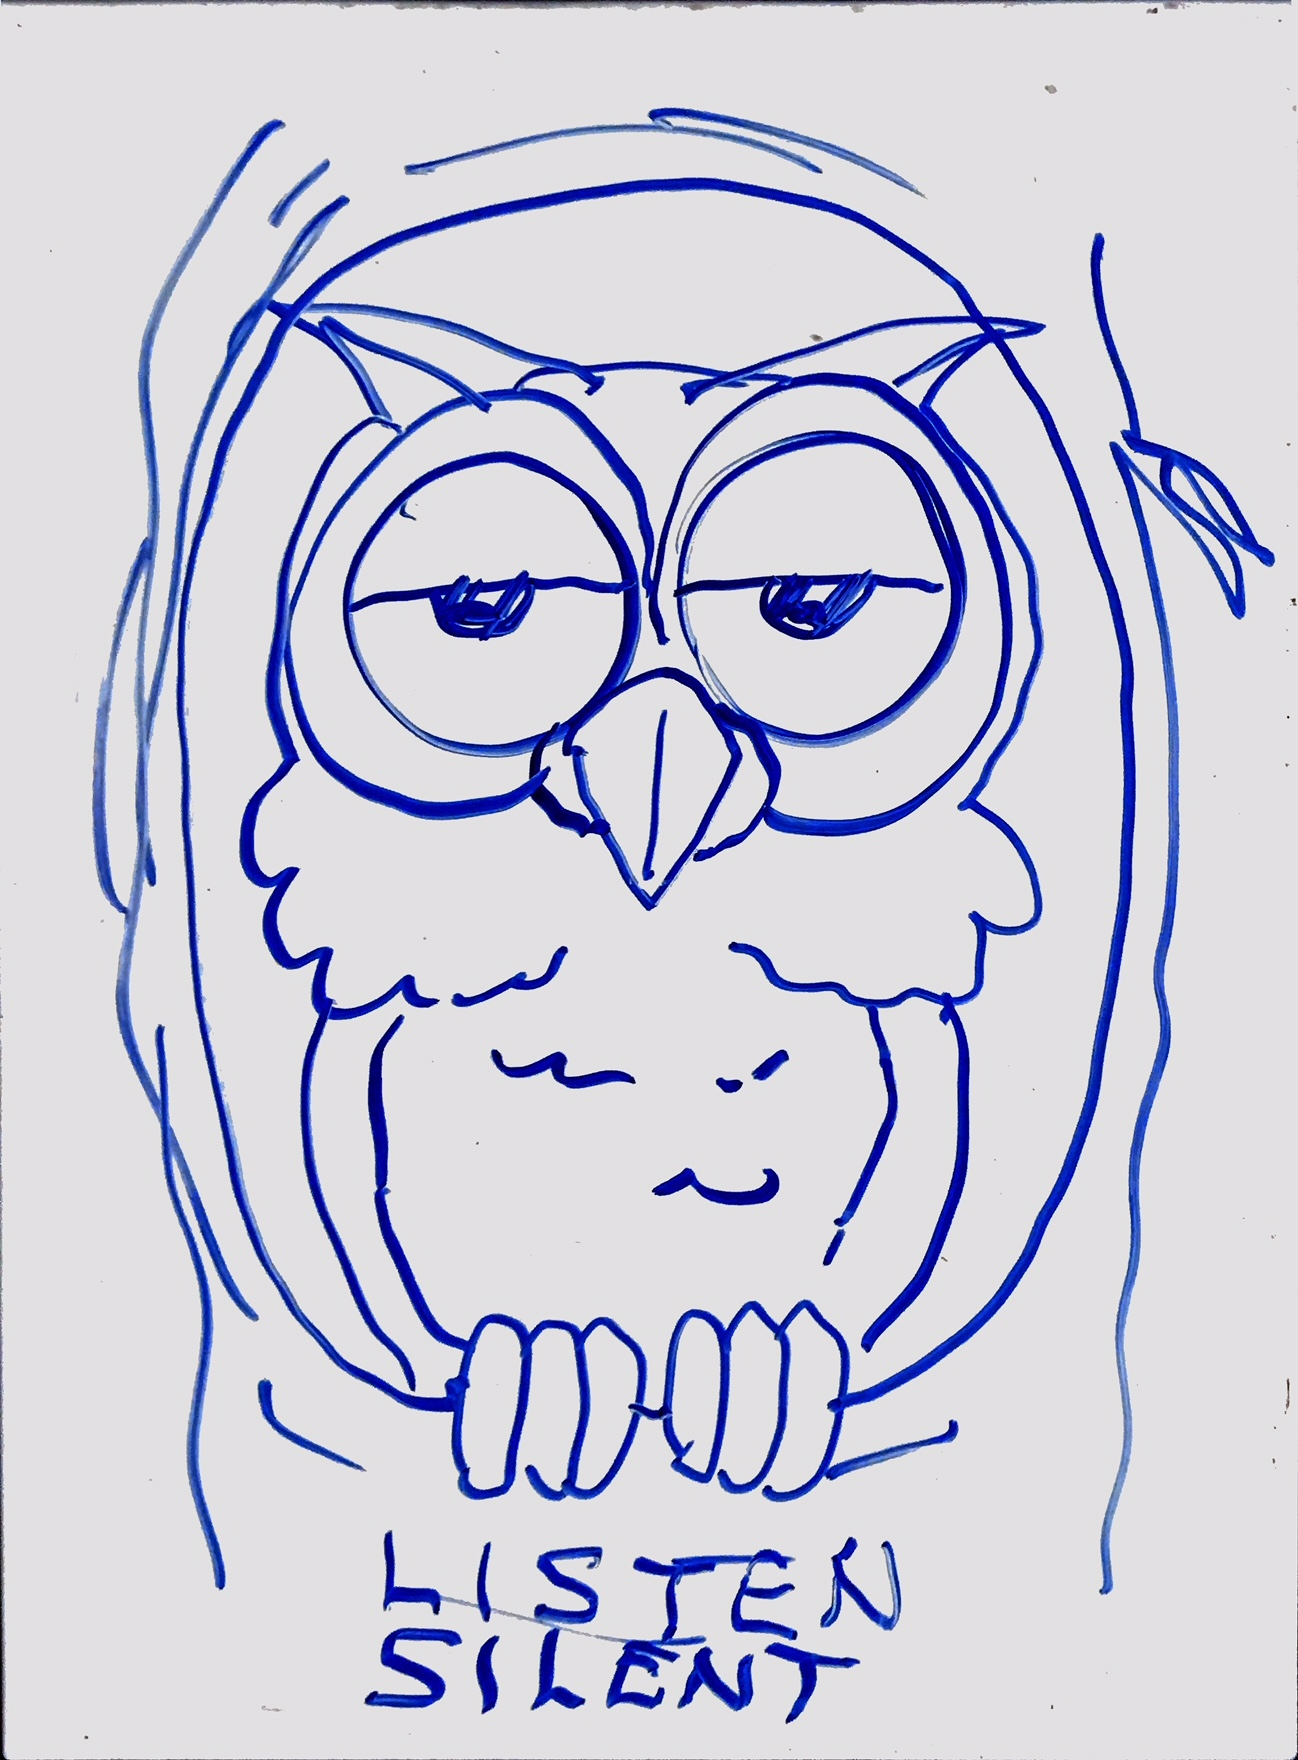 2018_09_30_Owl.JPG